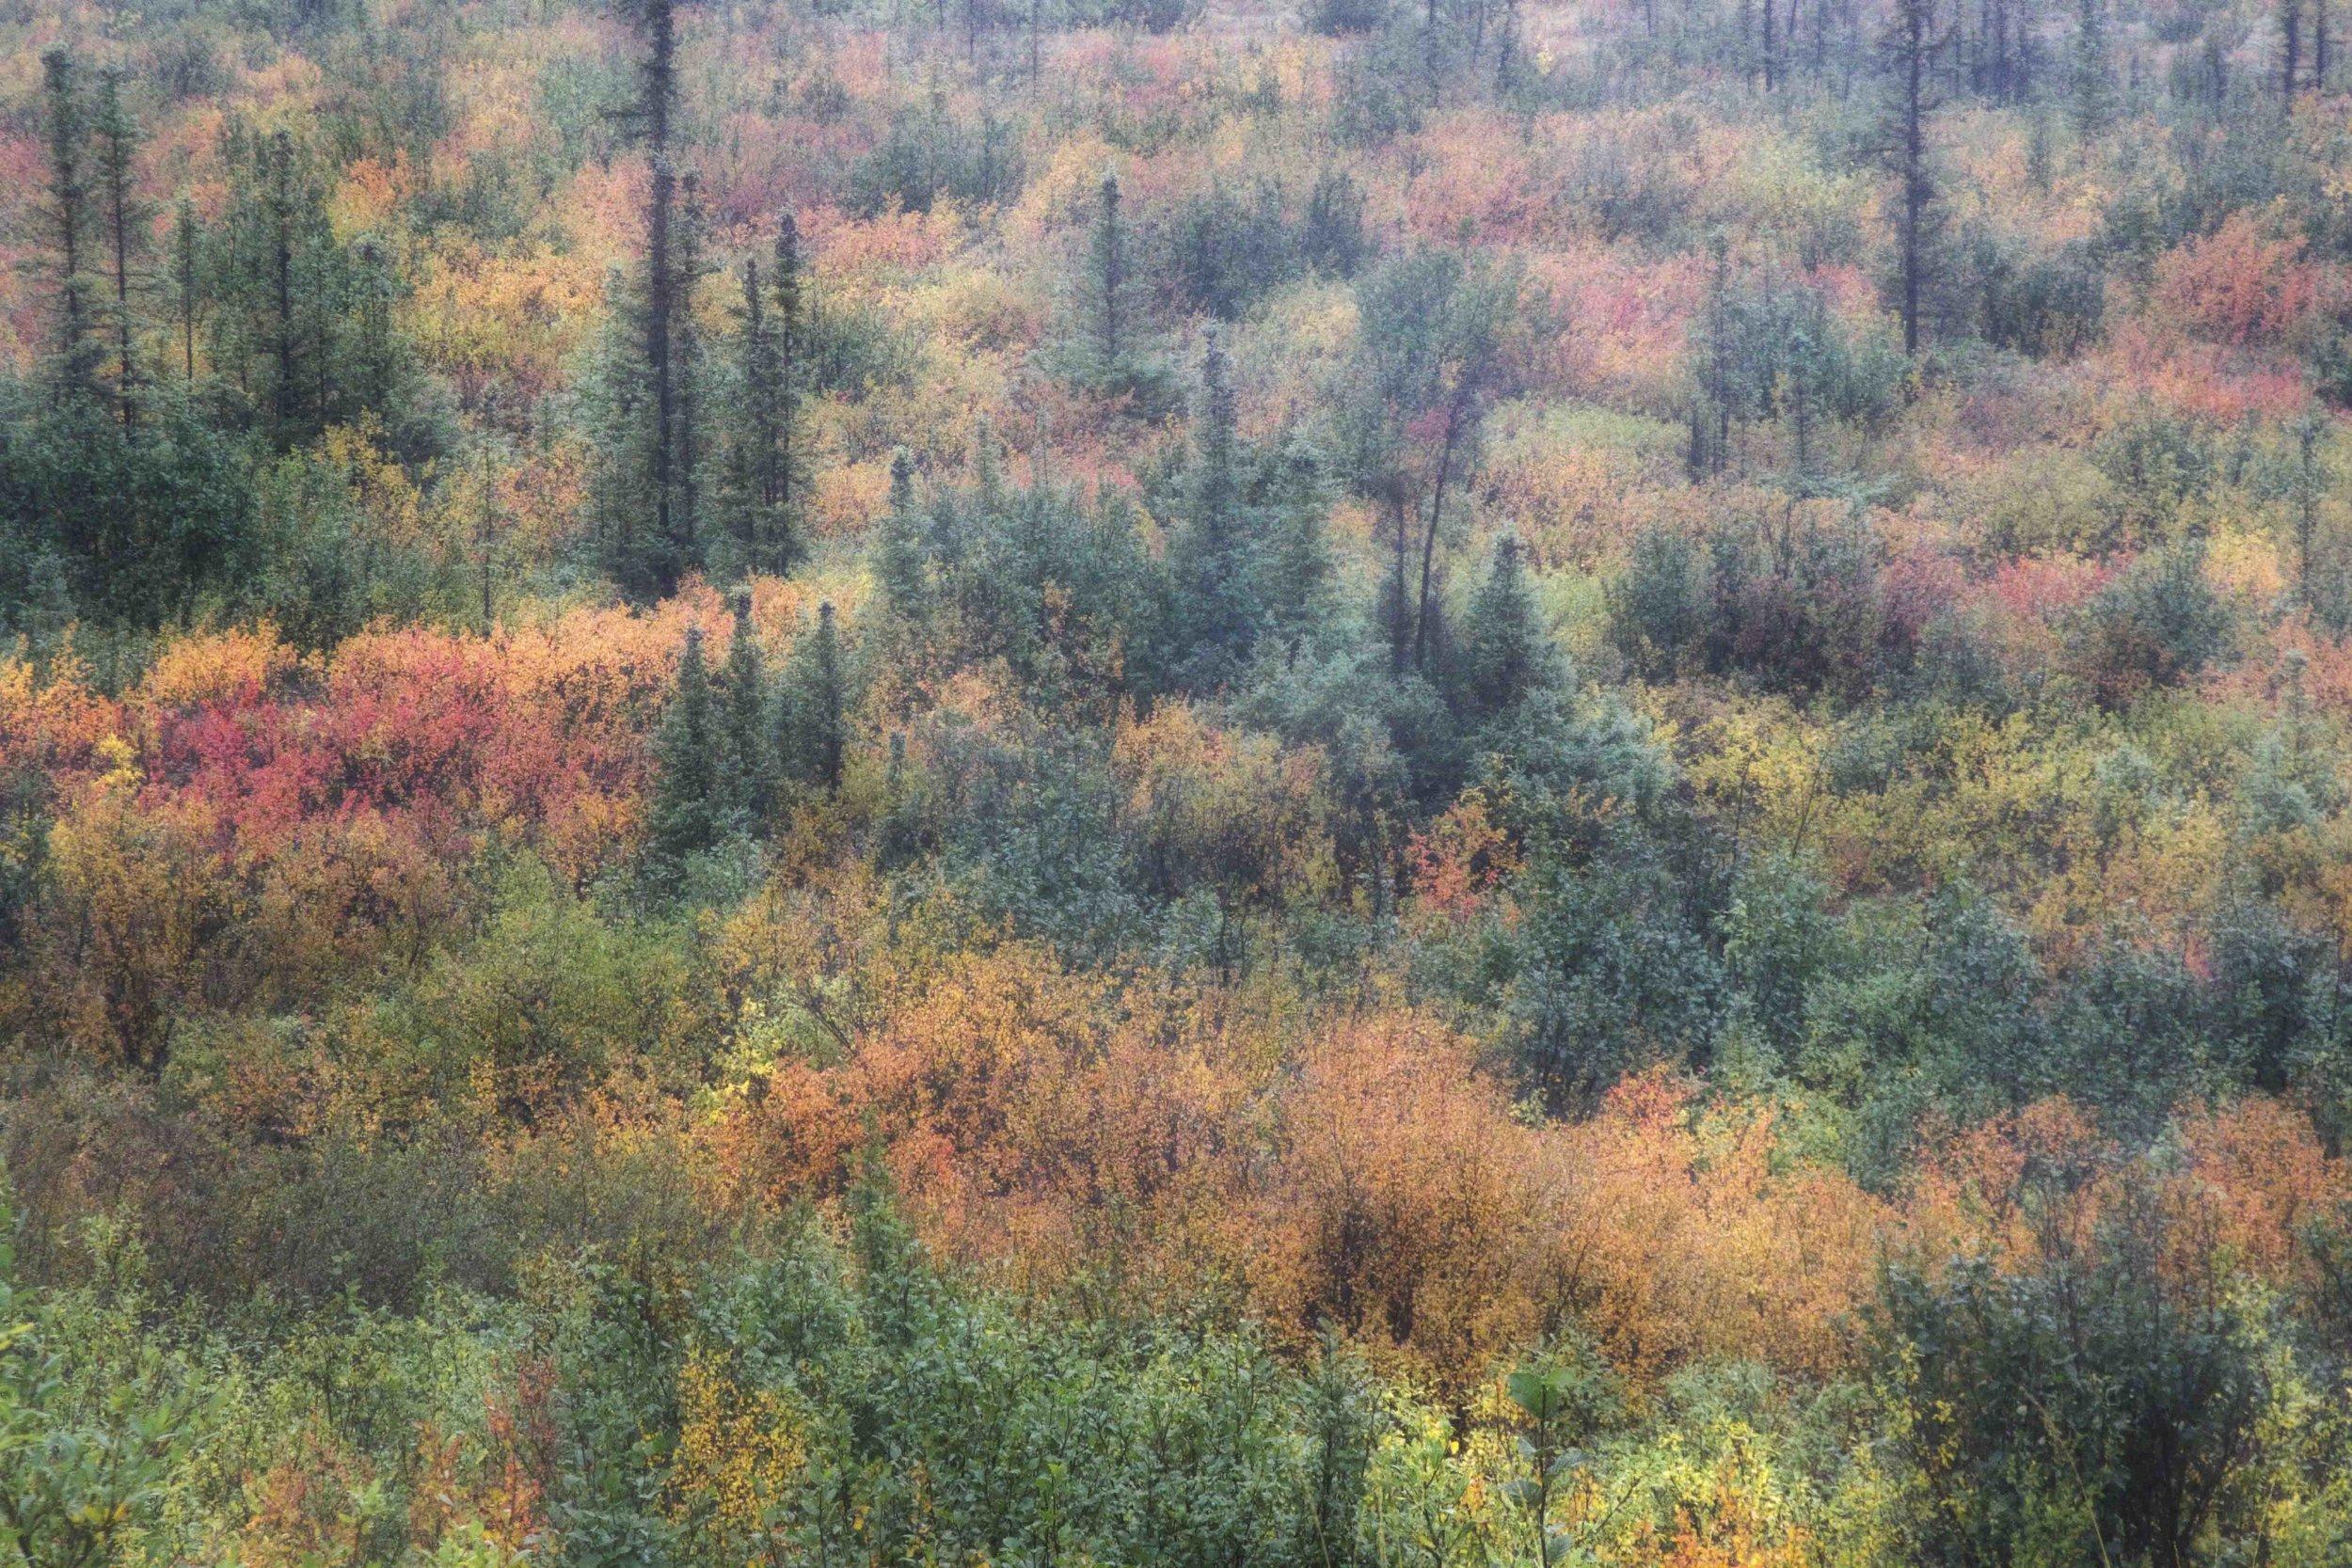 Dempster Highway, Roadtrip, Landscape, Arctic, rob gubiani, Tundra, Tombstone, Tuktoyuktuk, Inuvik, Dempster, Yukon, travel, wanderlust, fall,